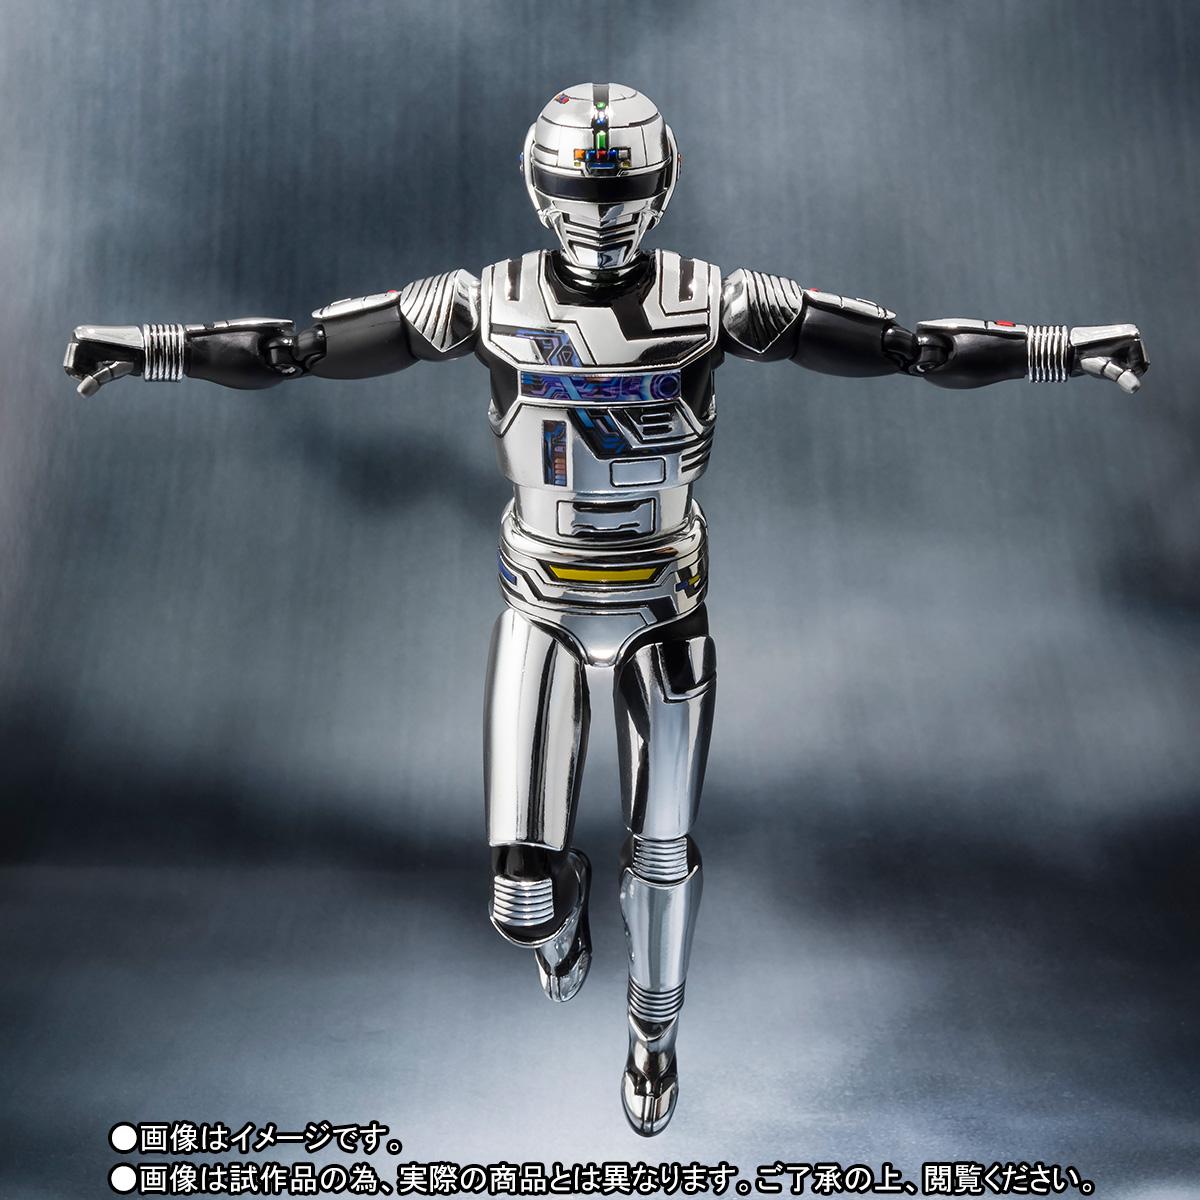 Figuarts Gavan Type G Space Squad Ver Bandai Japan Premium NEW Figure SH S.H